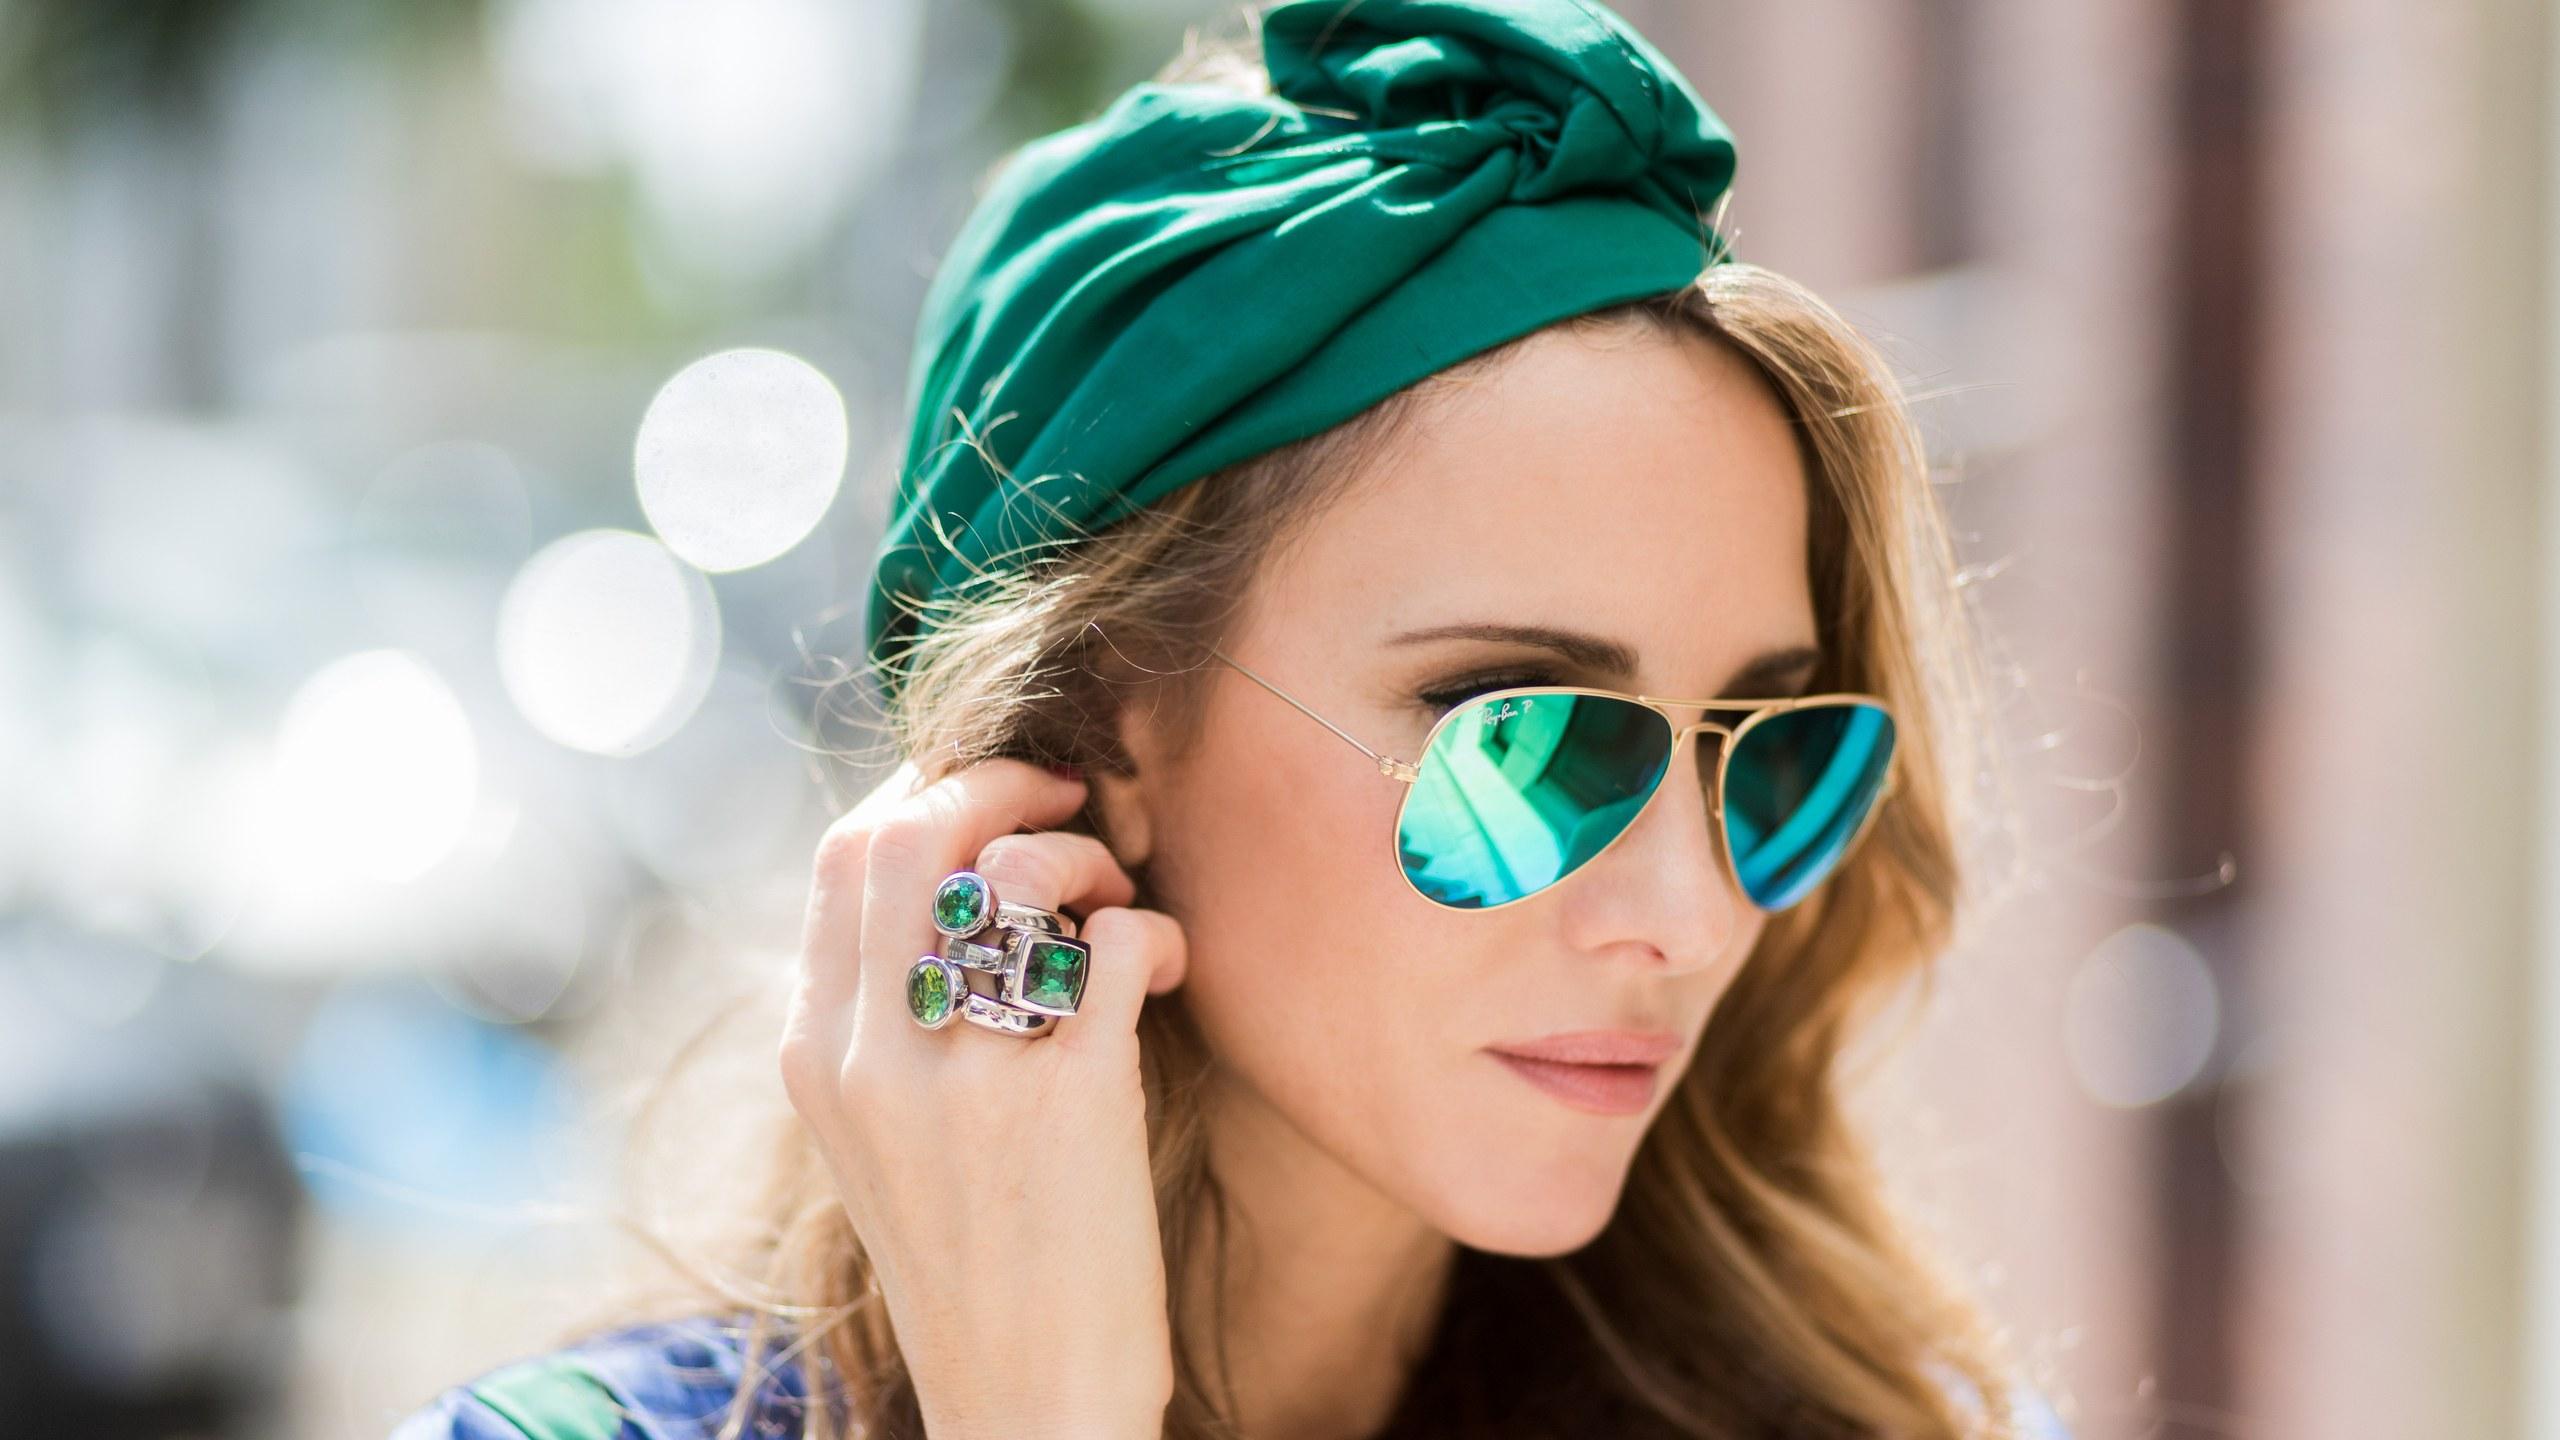 Femme voile vert porte rayban aviato